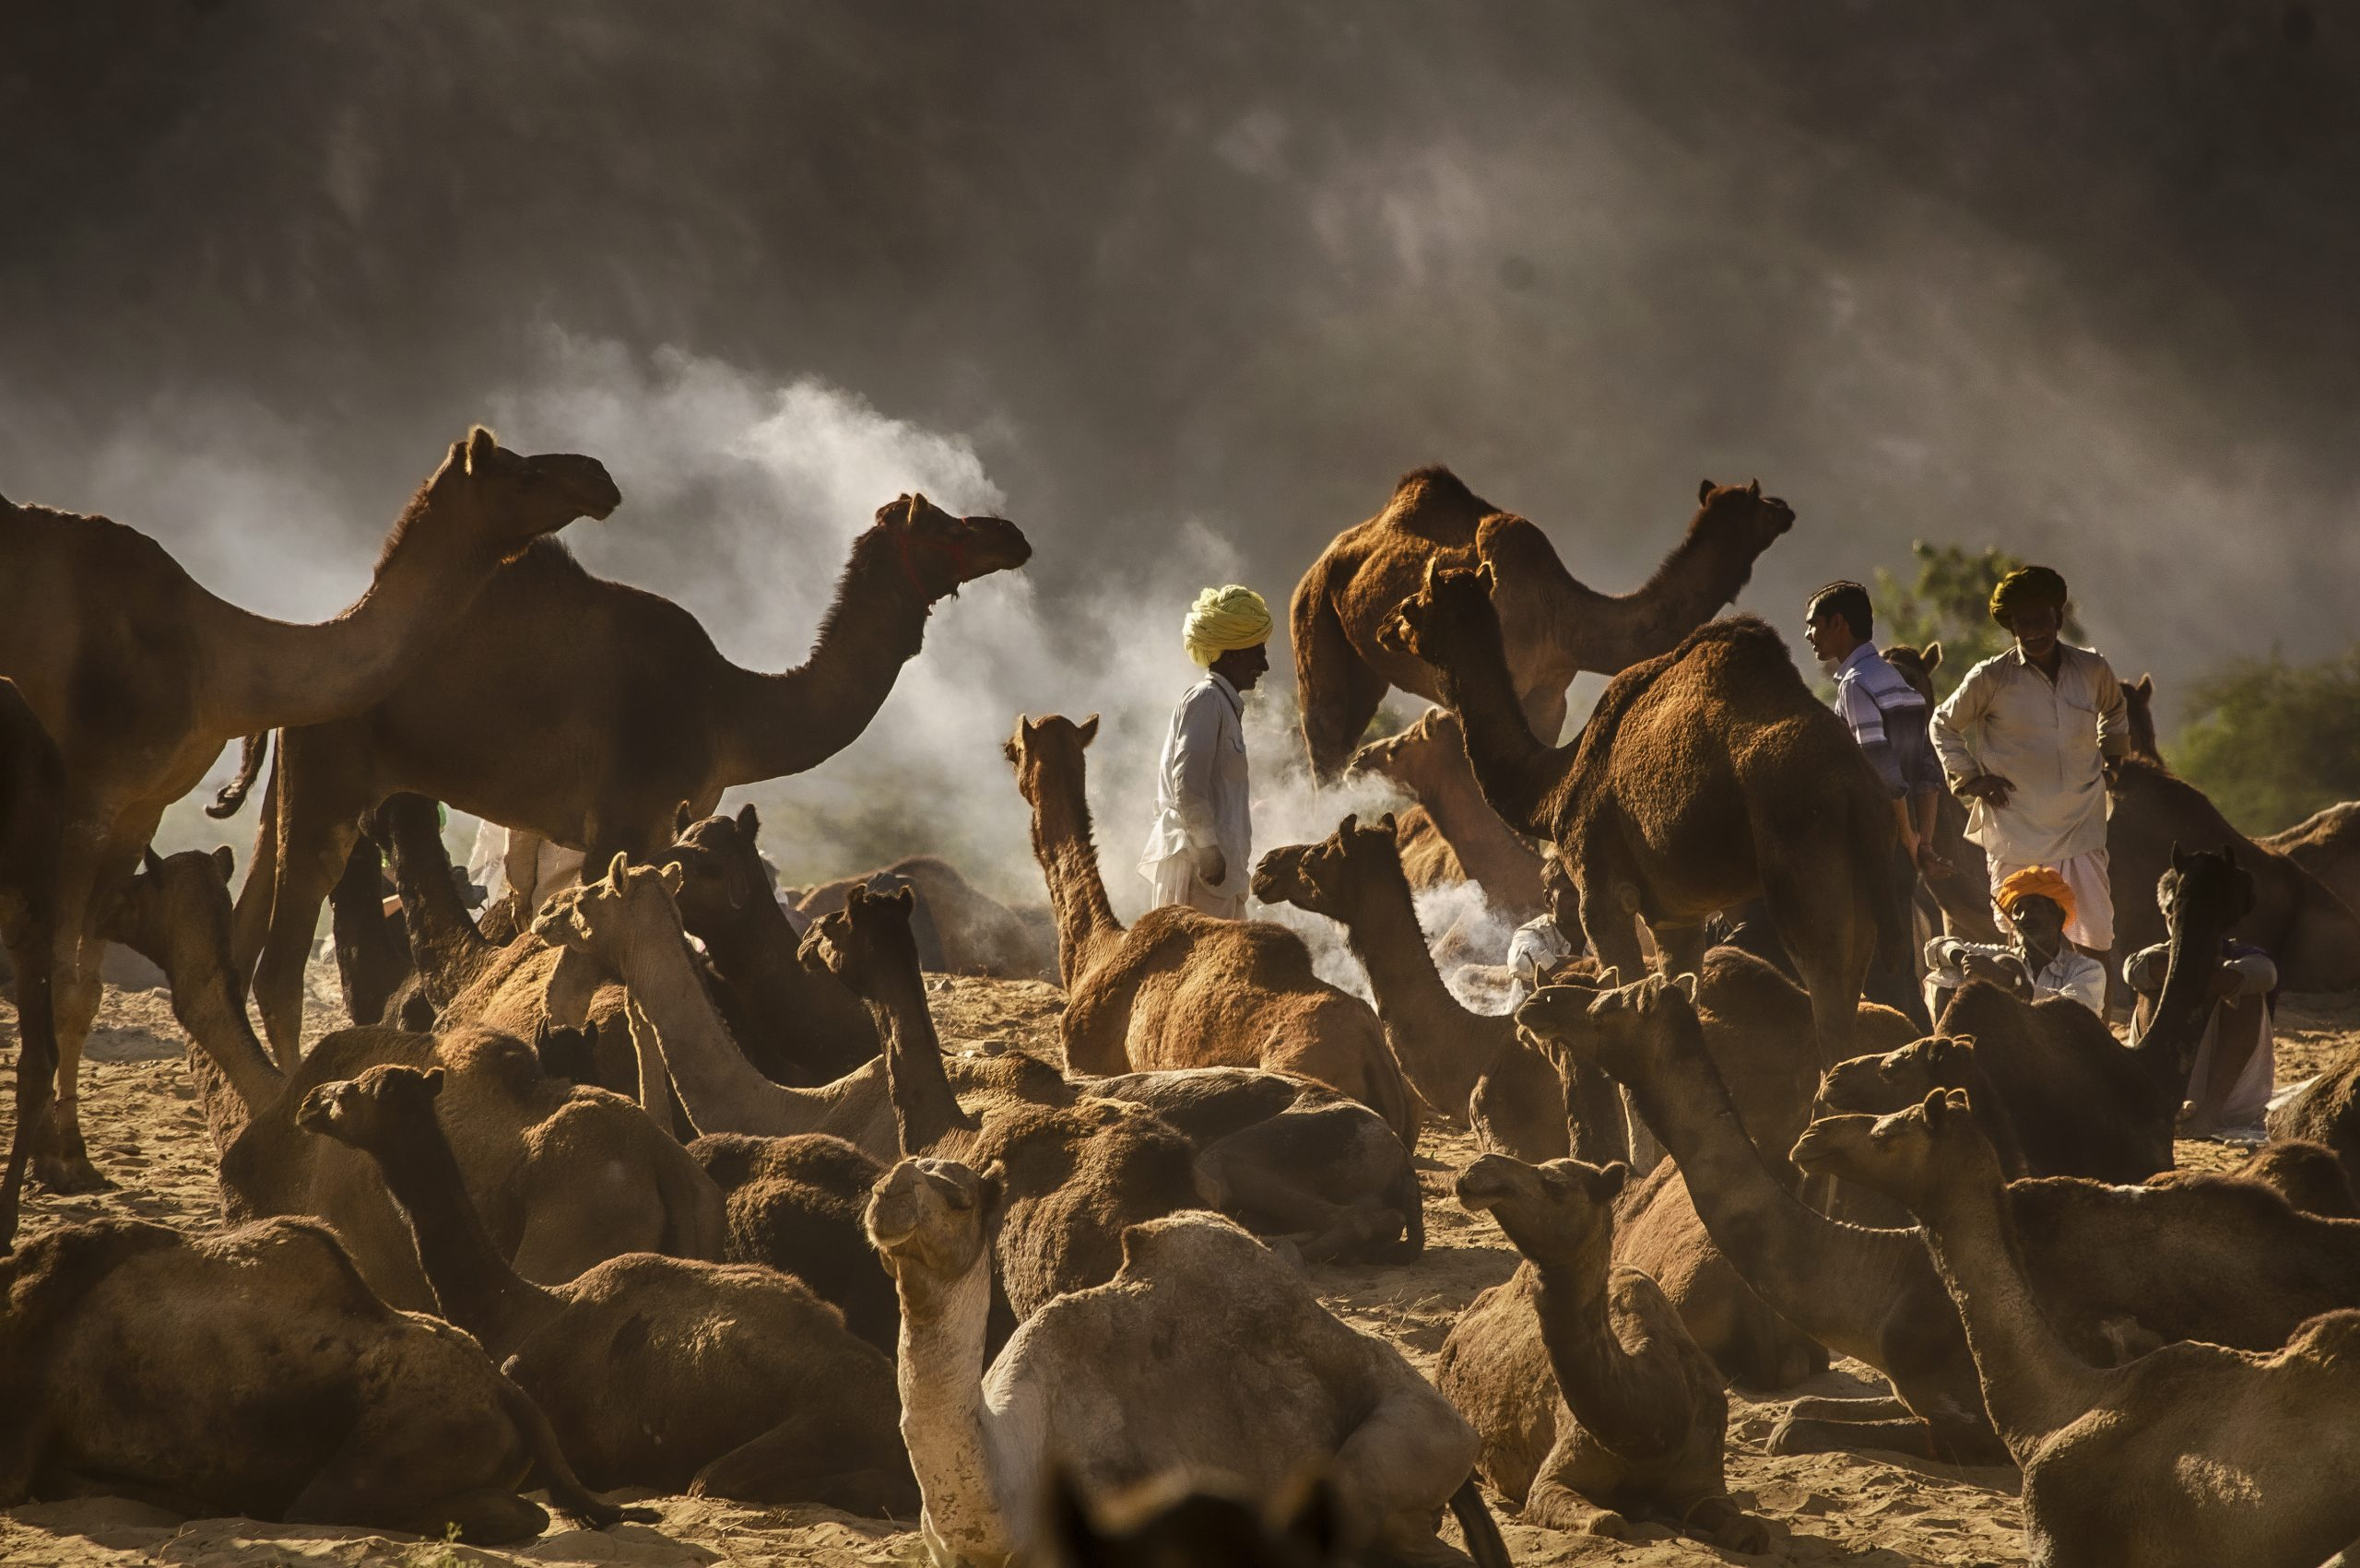 A Herd of Camel in the Desert